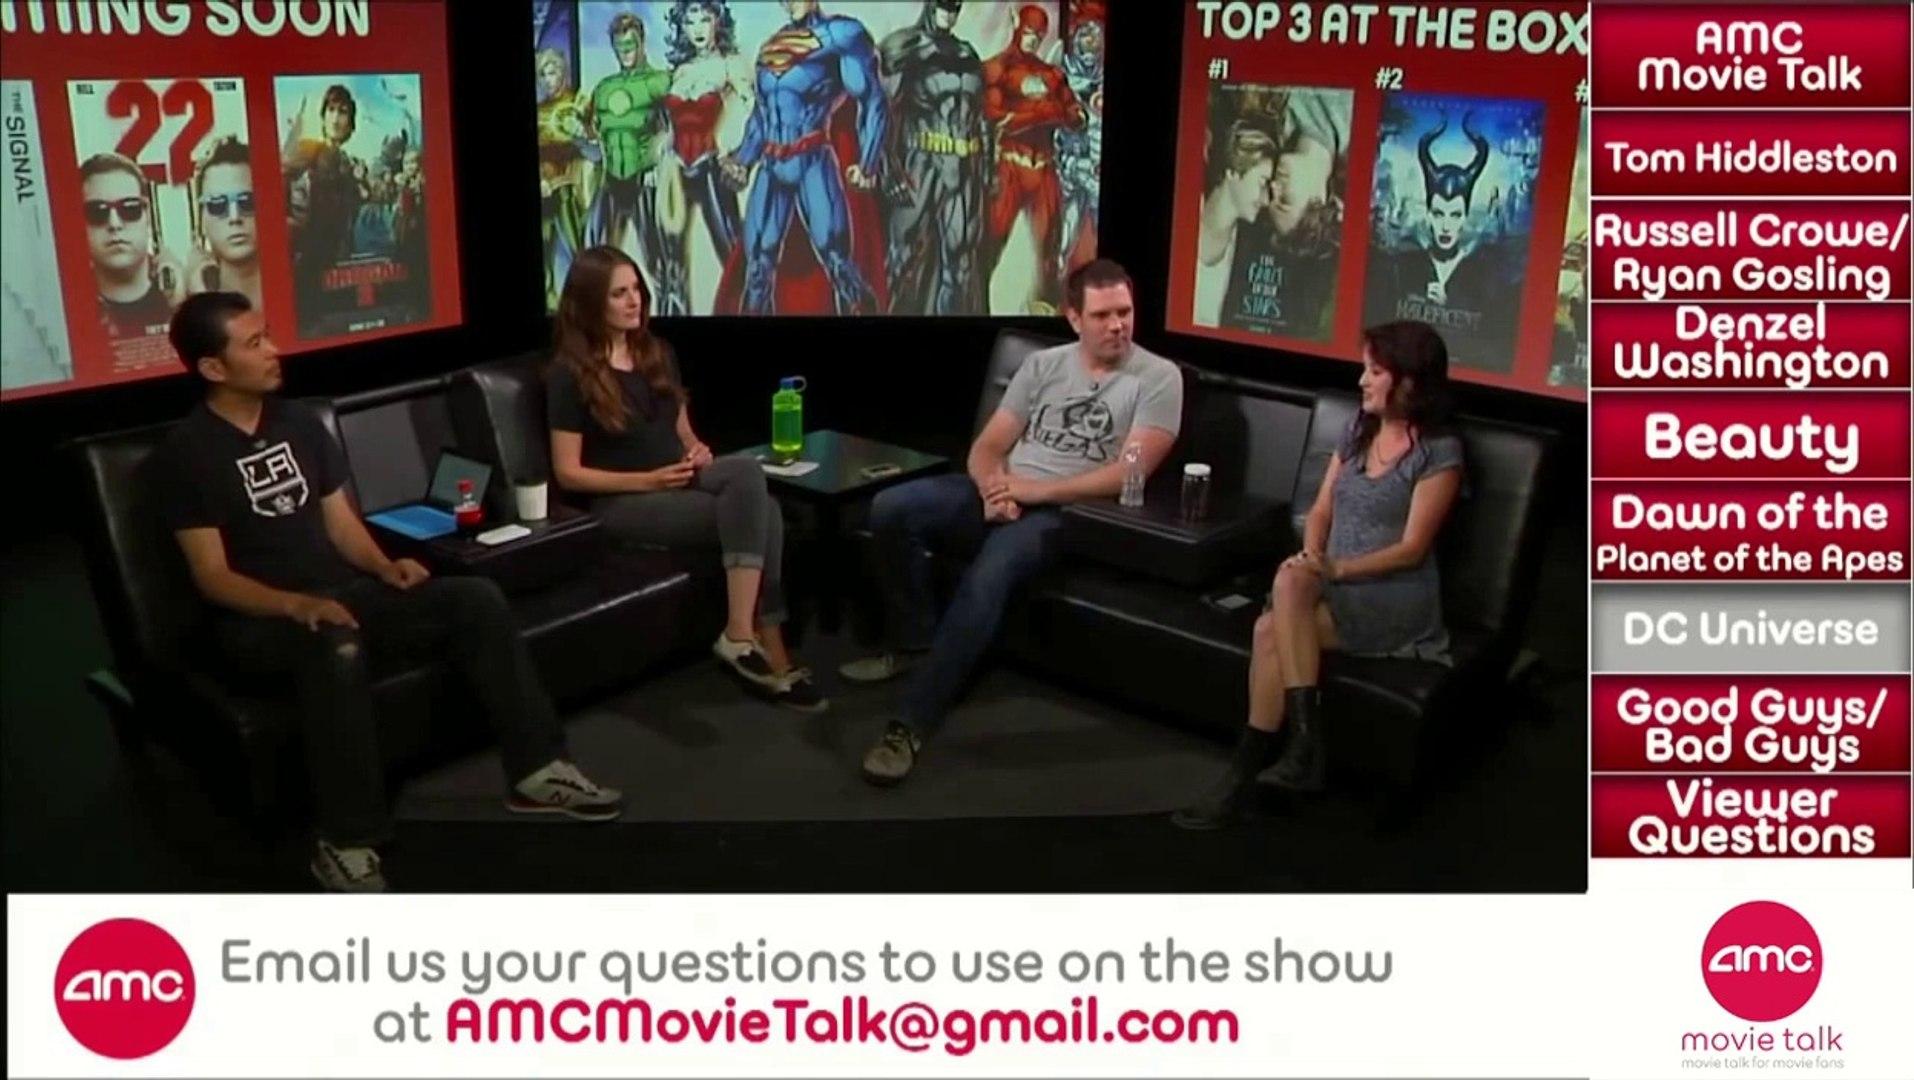 AMC Movie Talk - Justice League/DC Film Roster Revealed?Tom Hiddleston as Hank Williams,